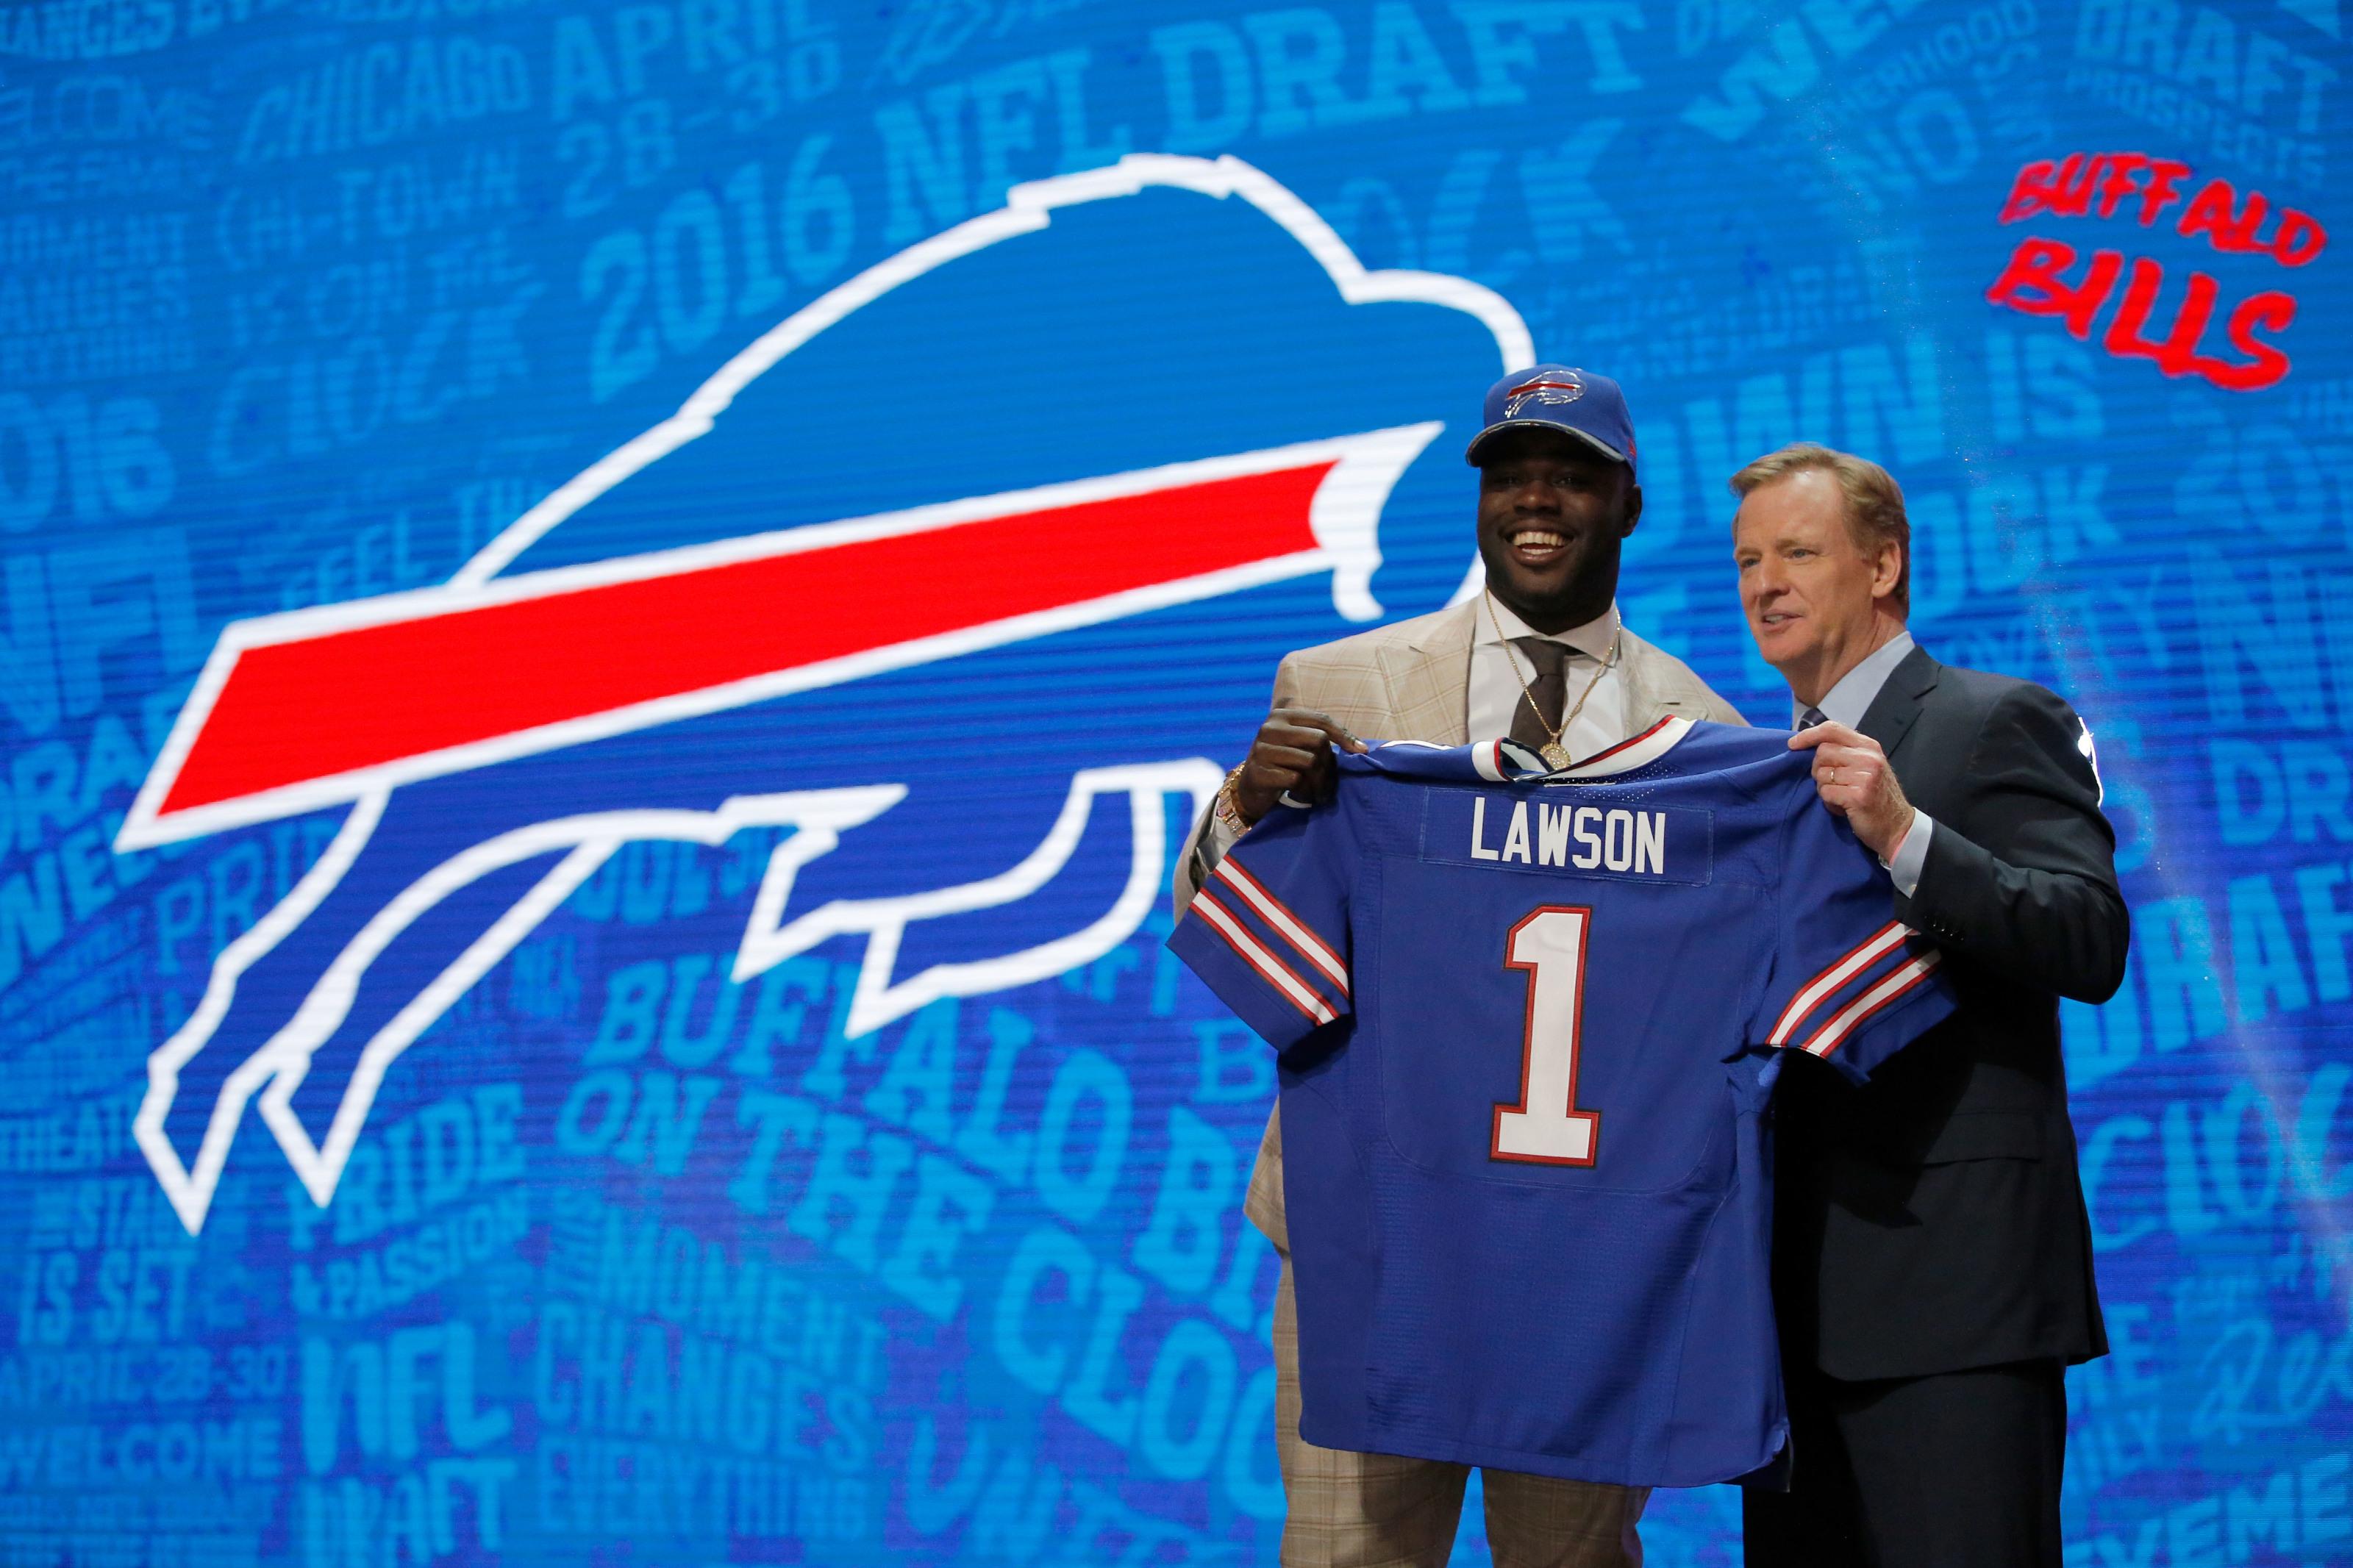 Buffalo Bills 2016 NFL Draft Retrospective